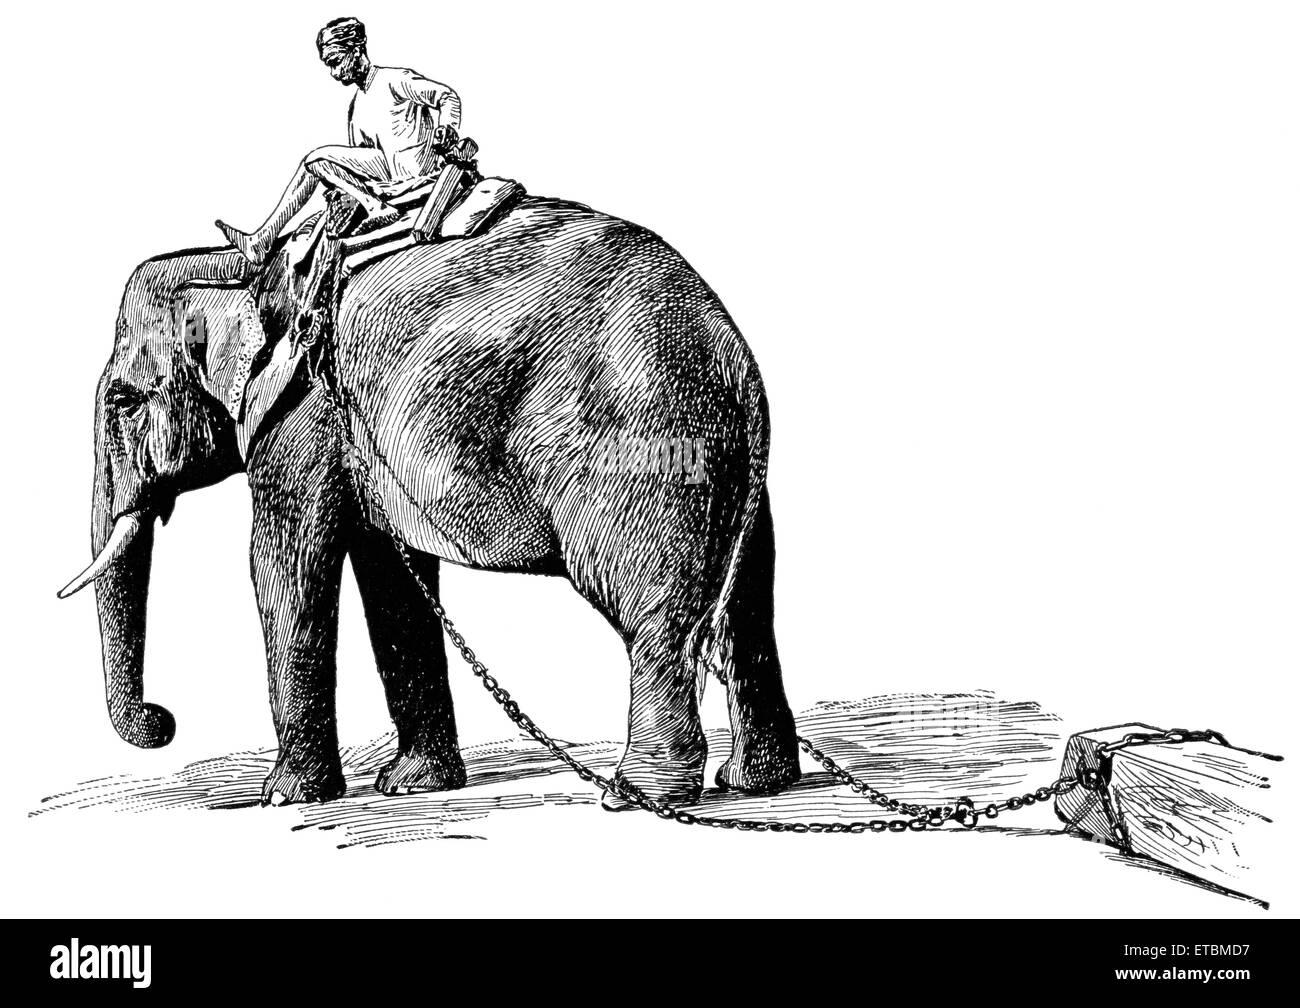 Elephant Pulling Timber, Rangoon, Burma, 'Classical Portfolio of Primitive Carriers', by Marshall M. Kirman, - Stock Image